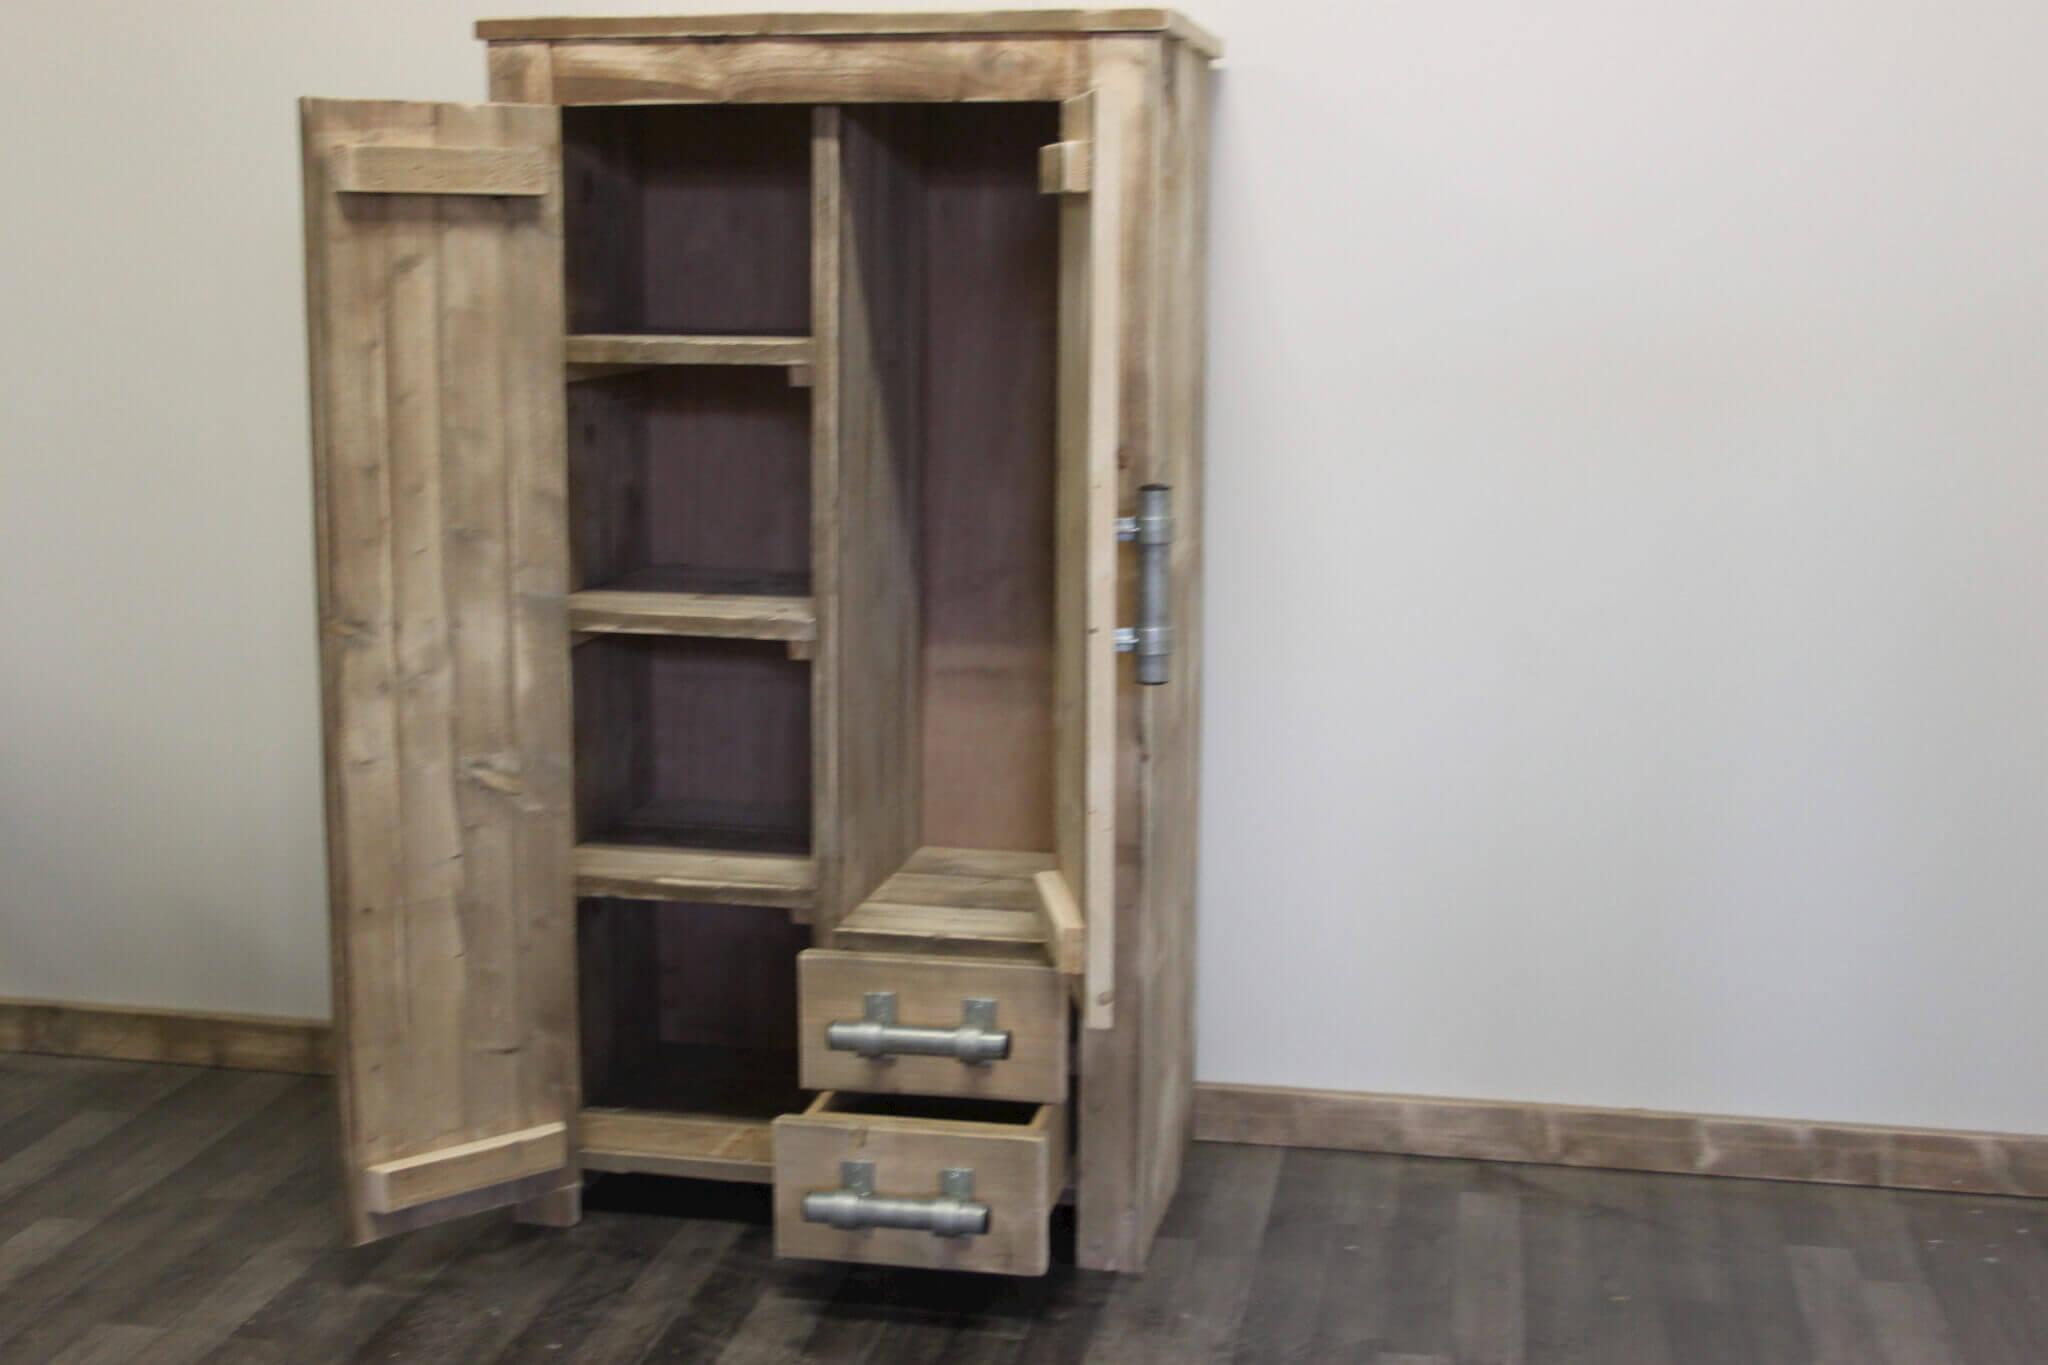 Steigerhouten kast Provo – SteigerhoutTrend